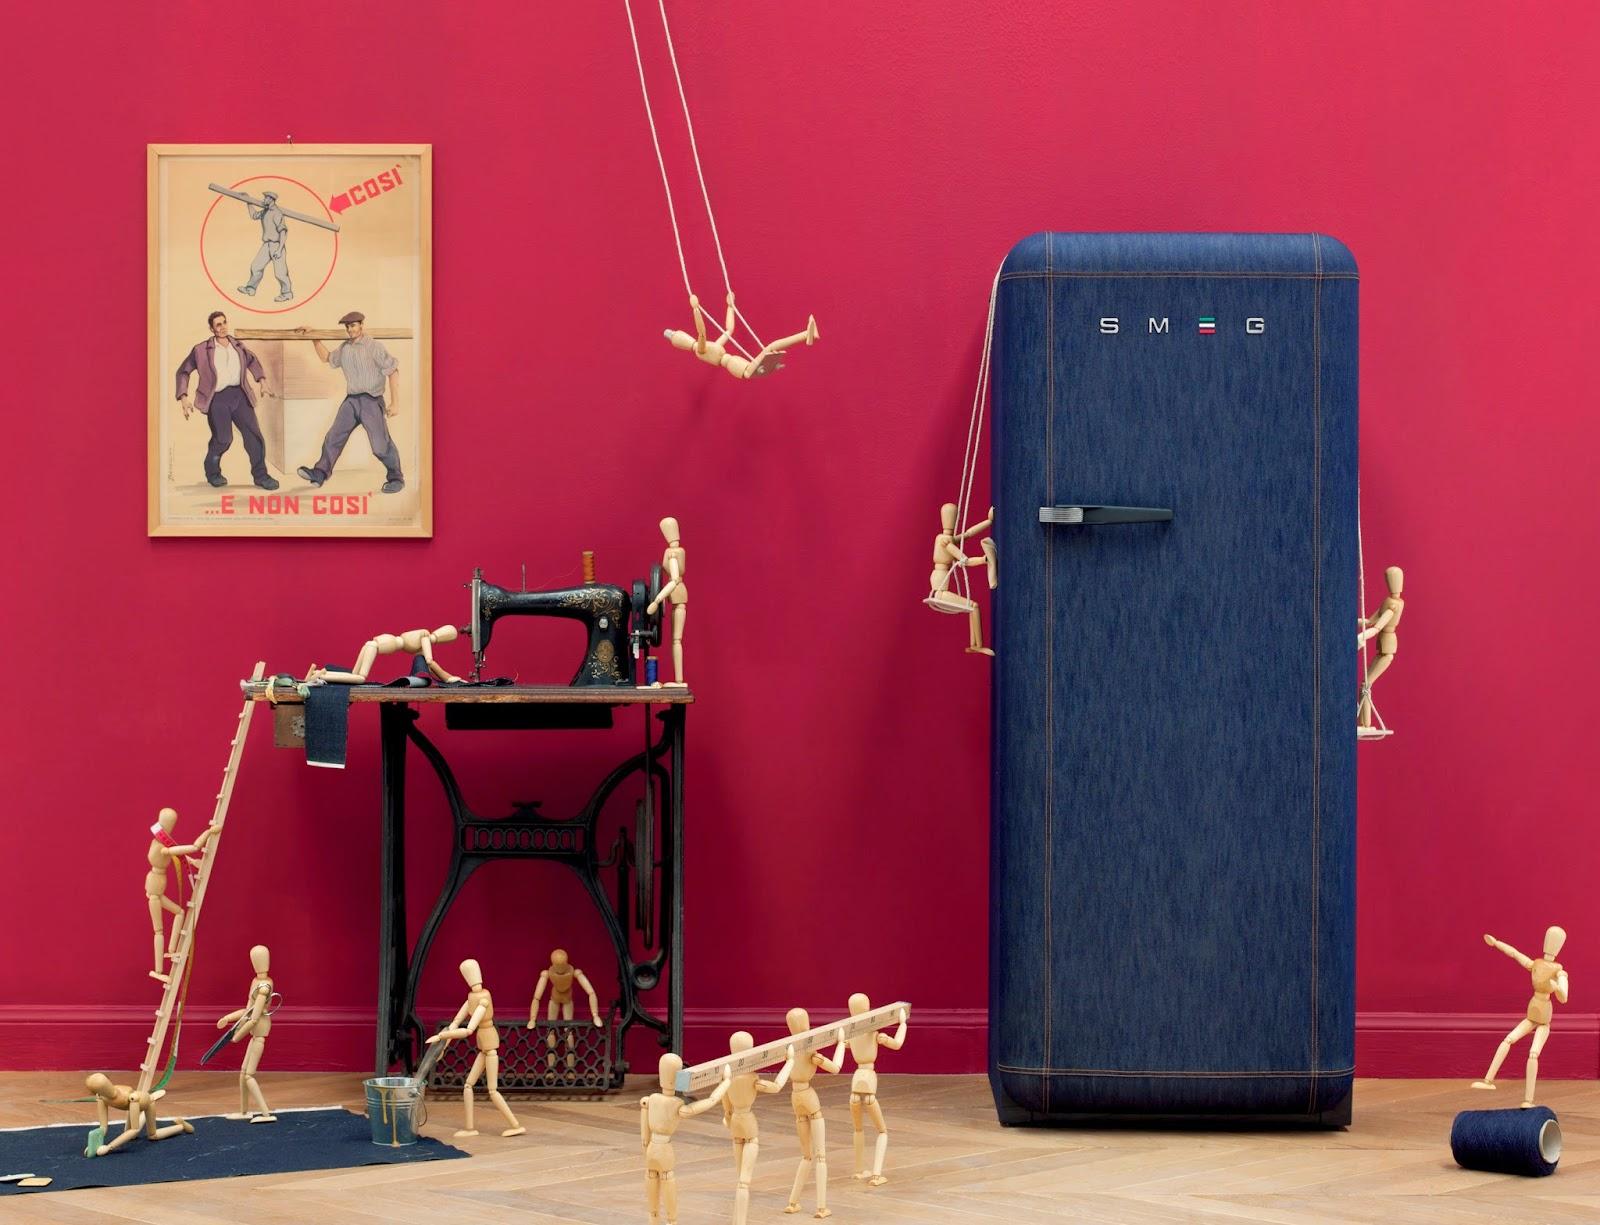 frigorifero bombato smeg in tela denim jeans design